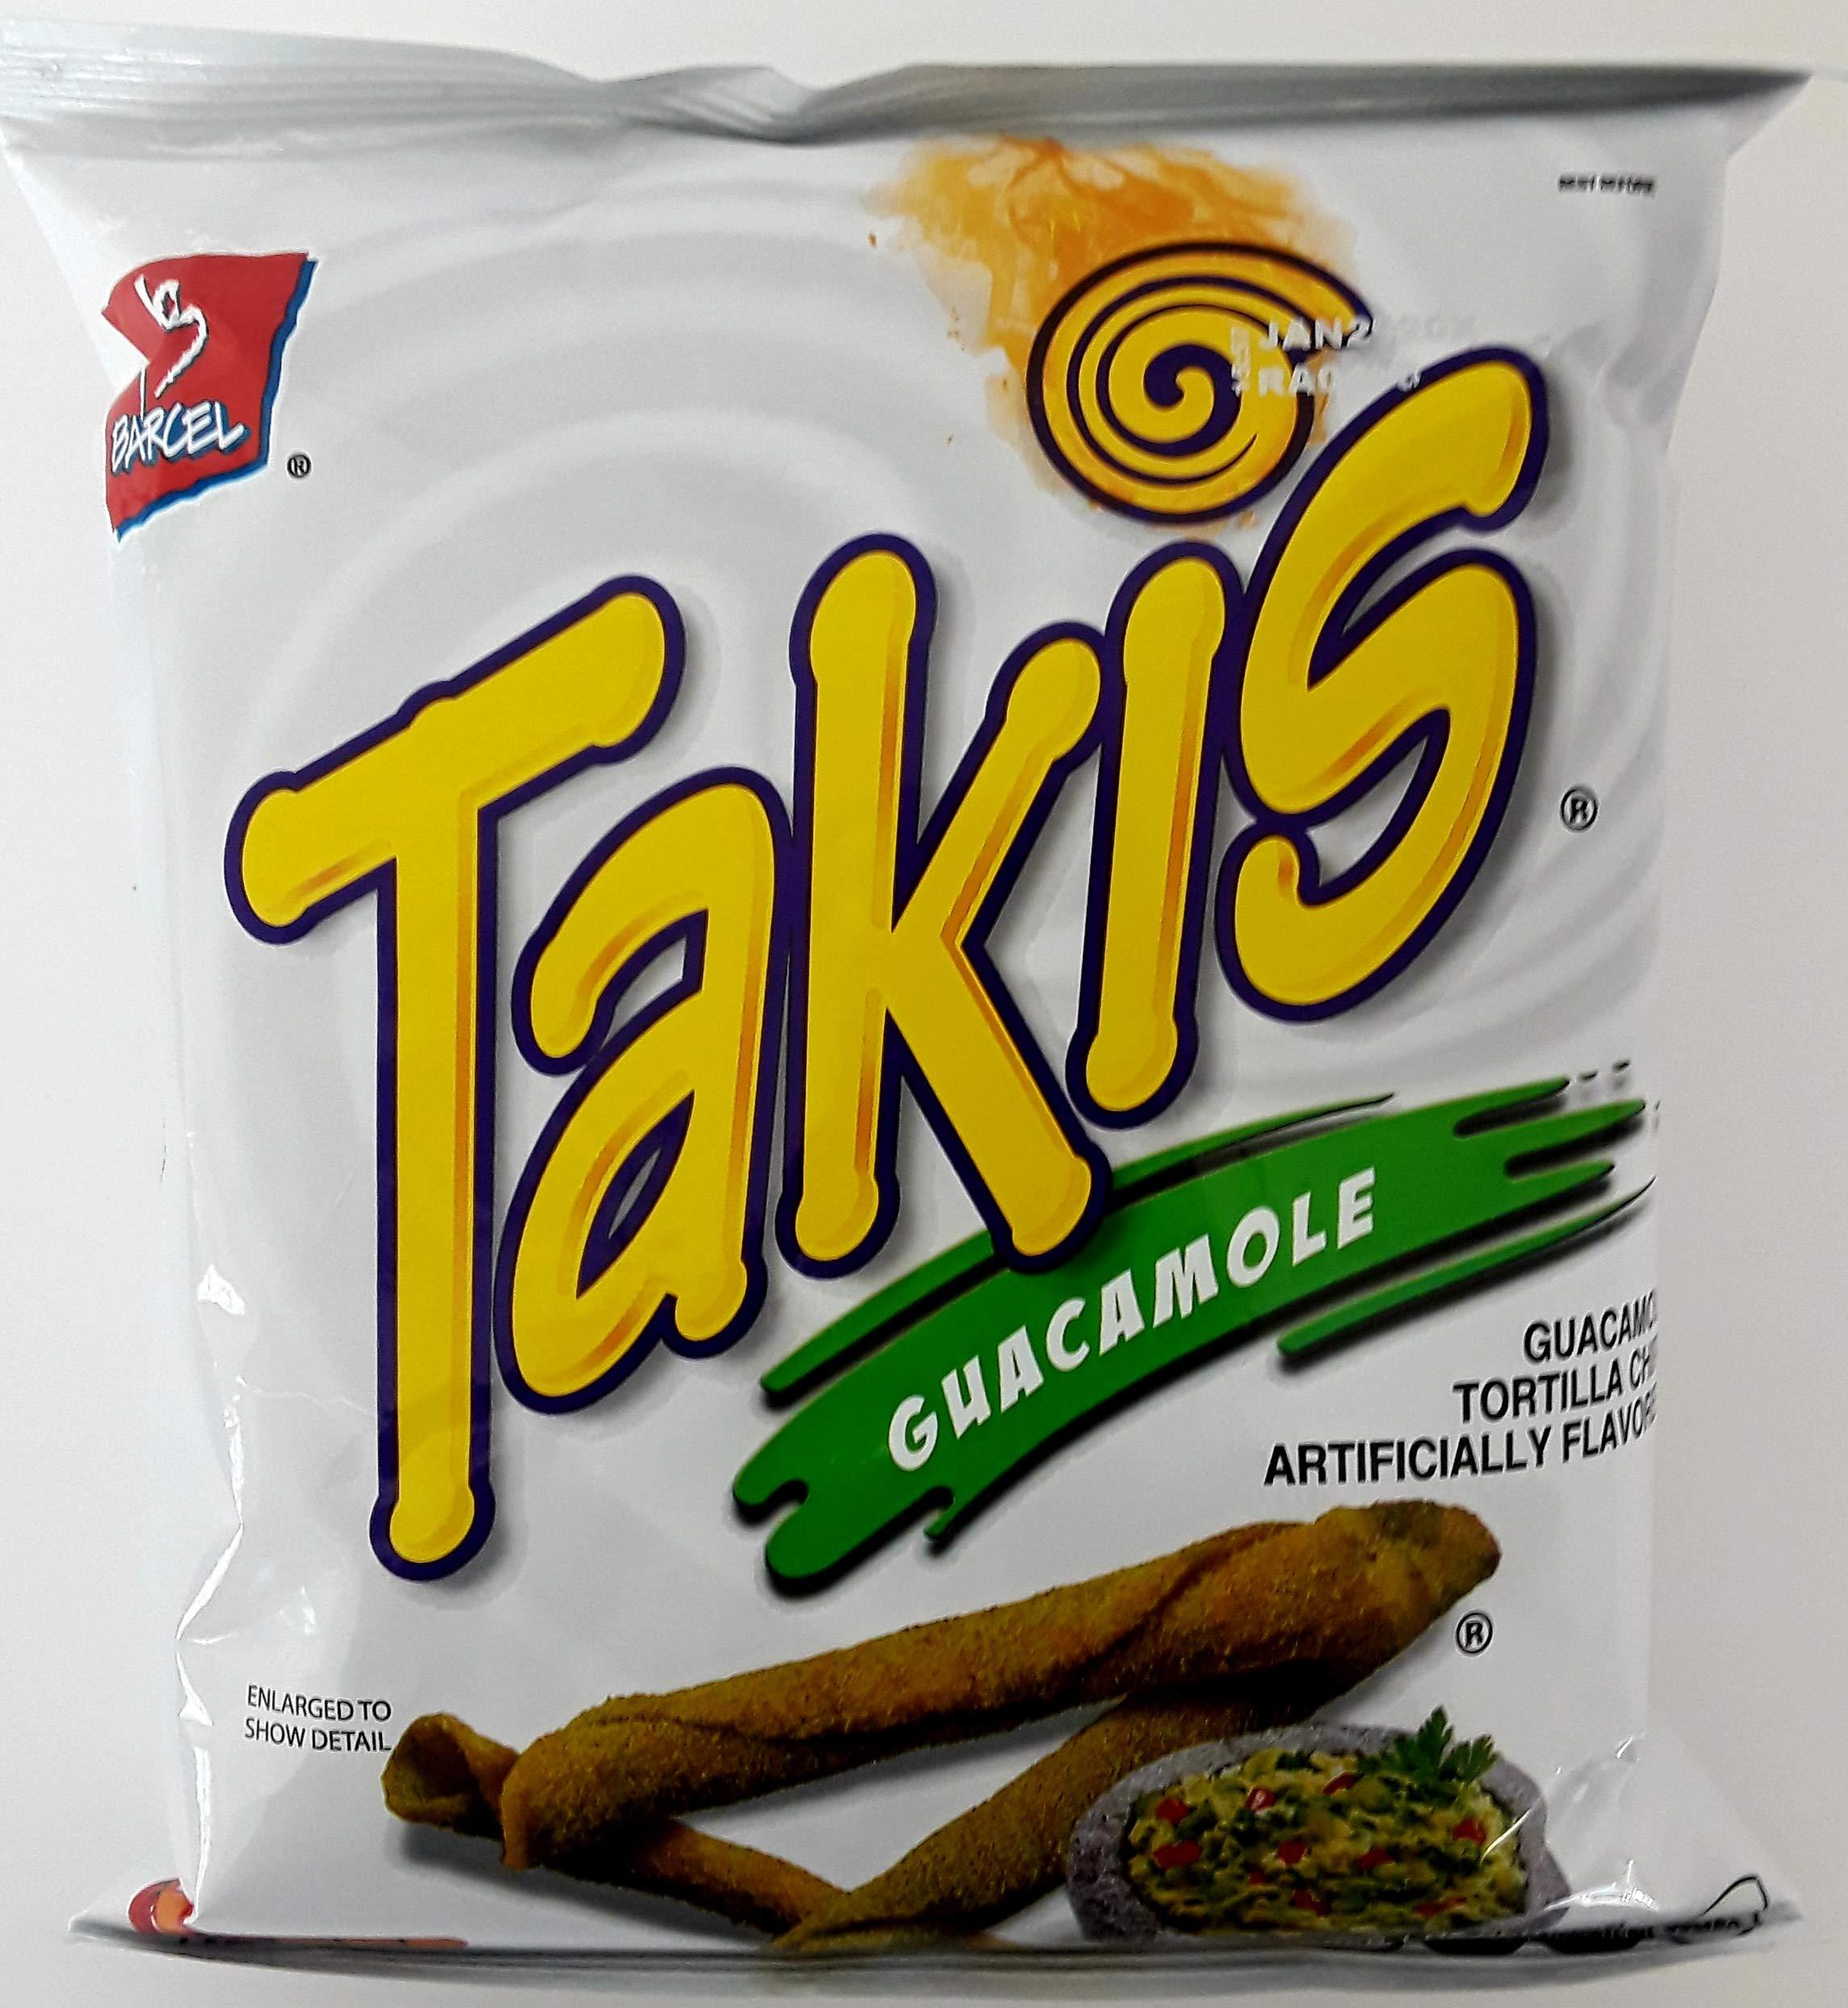 Takis Guacamole 4 Oz Pack of 2